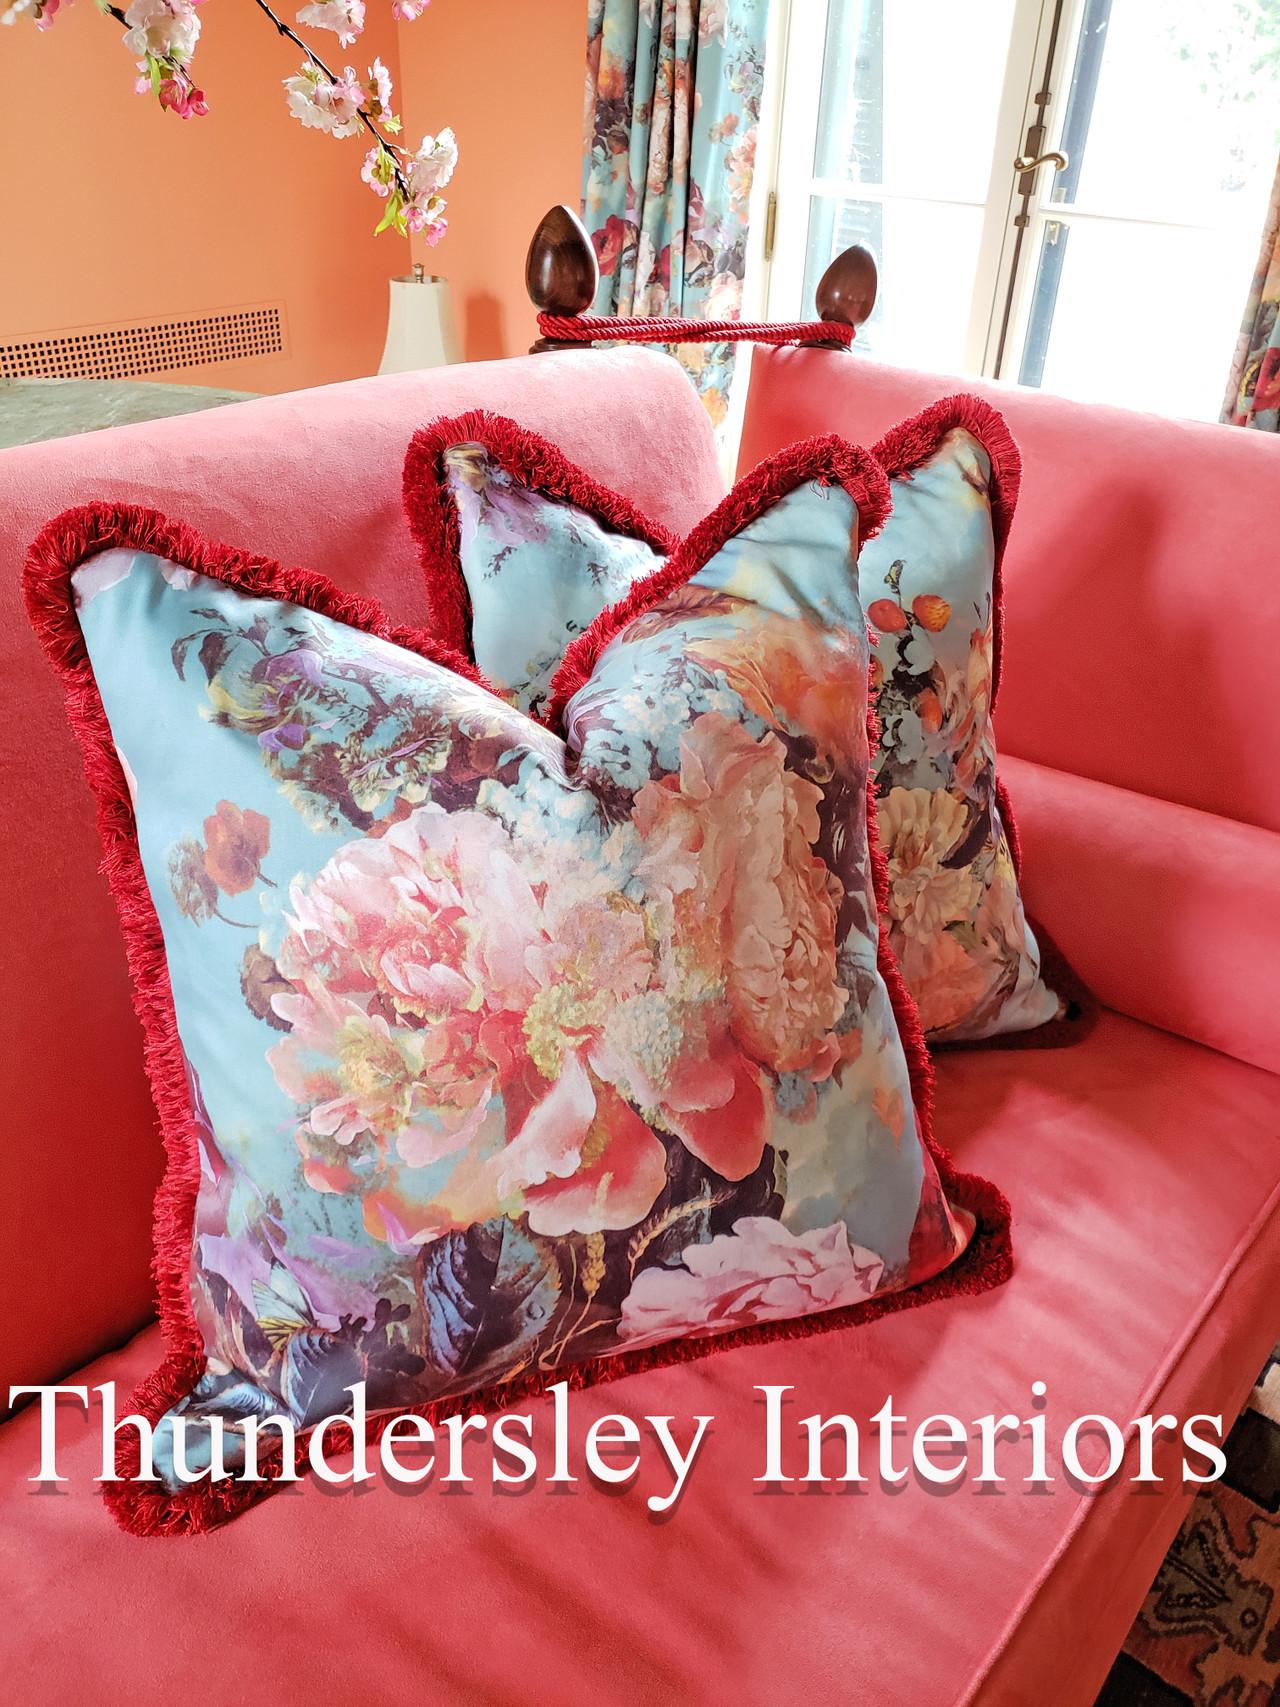 luxury throw pillows in Stamford, CT | Thundersley Interiors